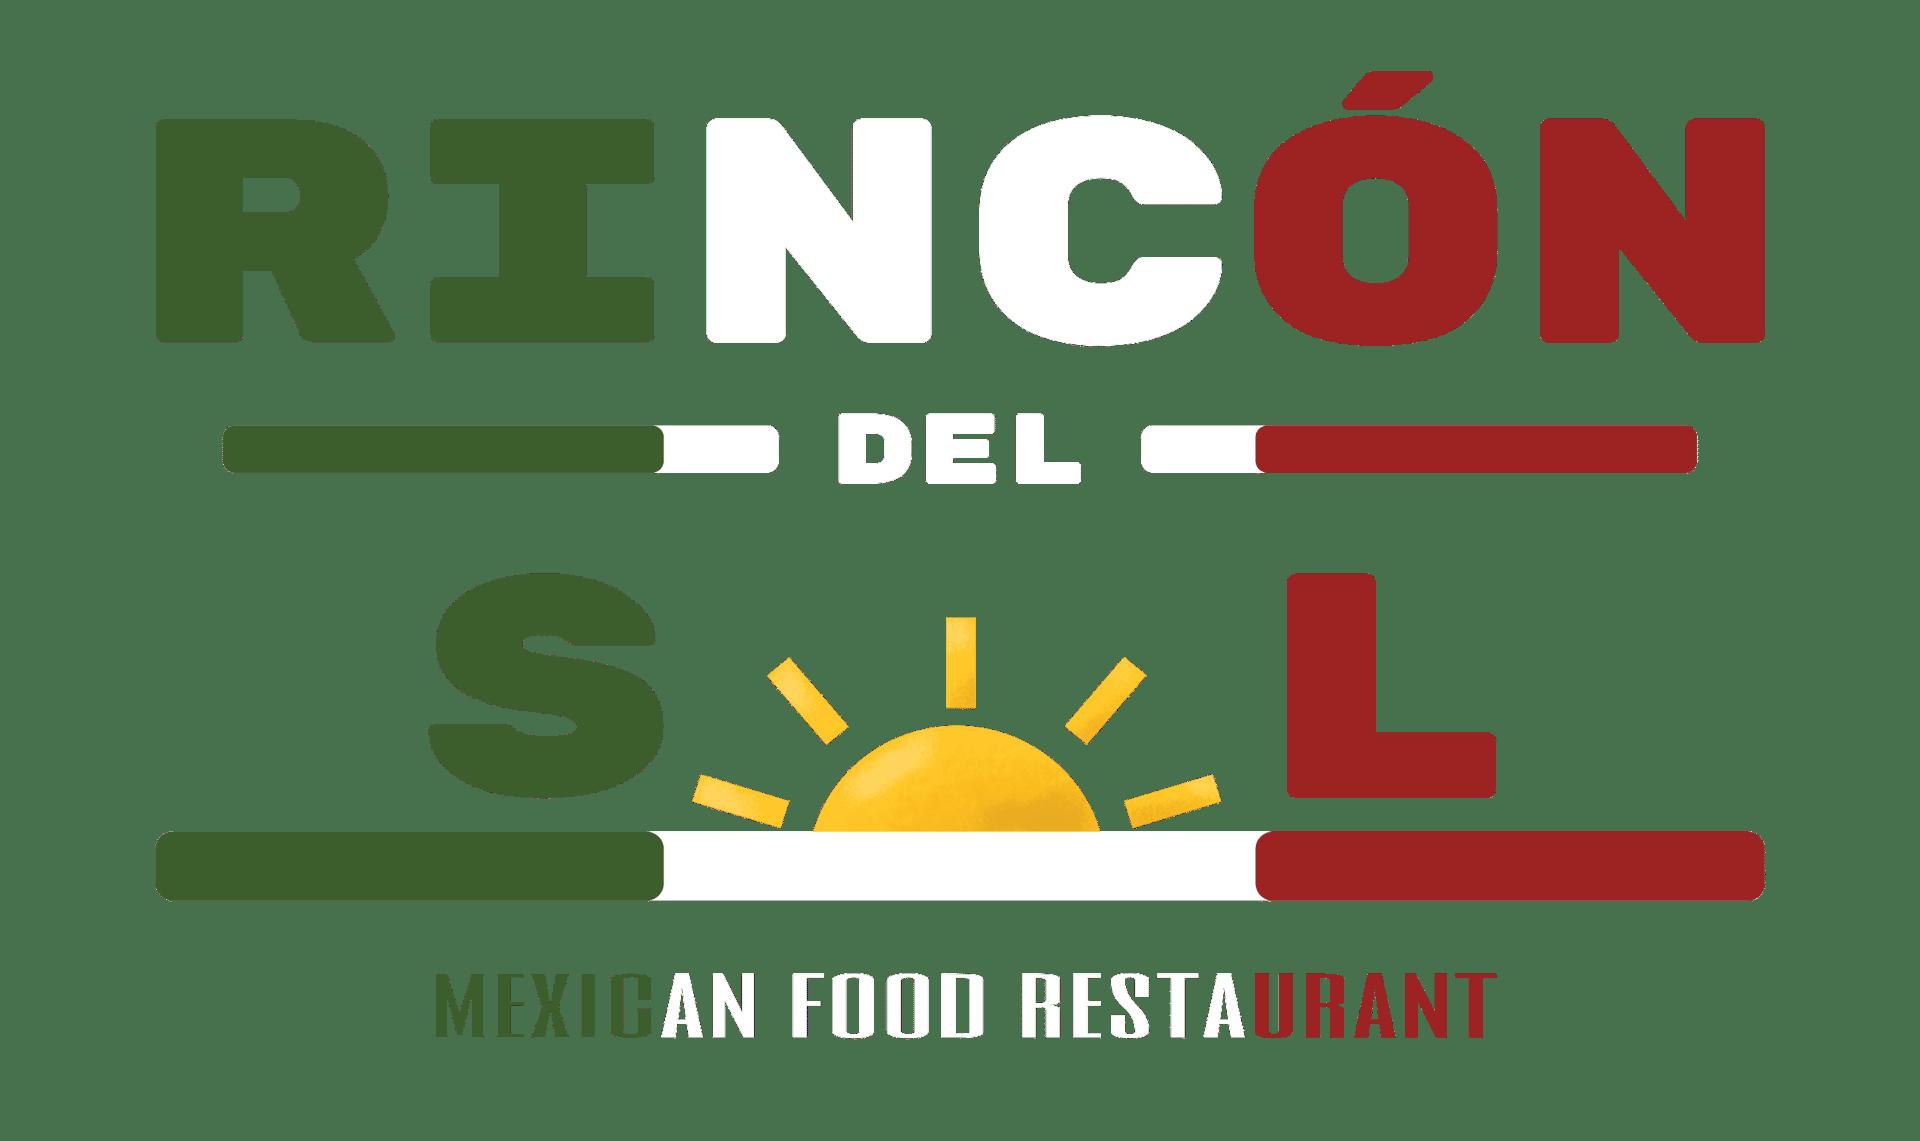 Rincon del Sol restaurant logo